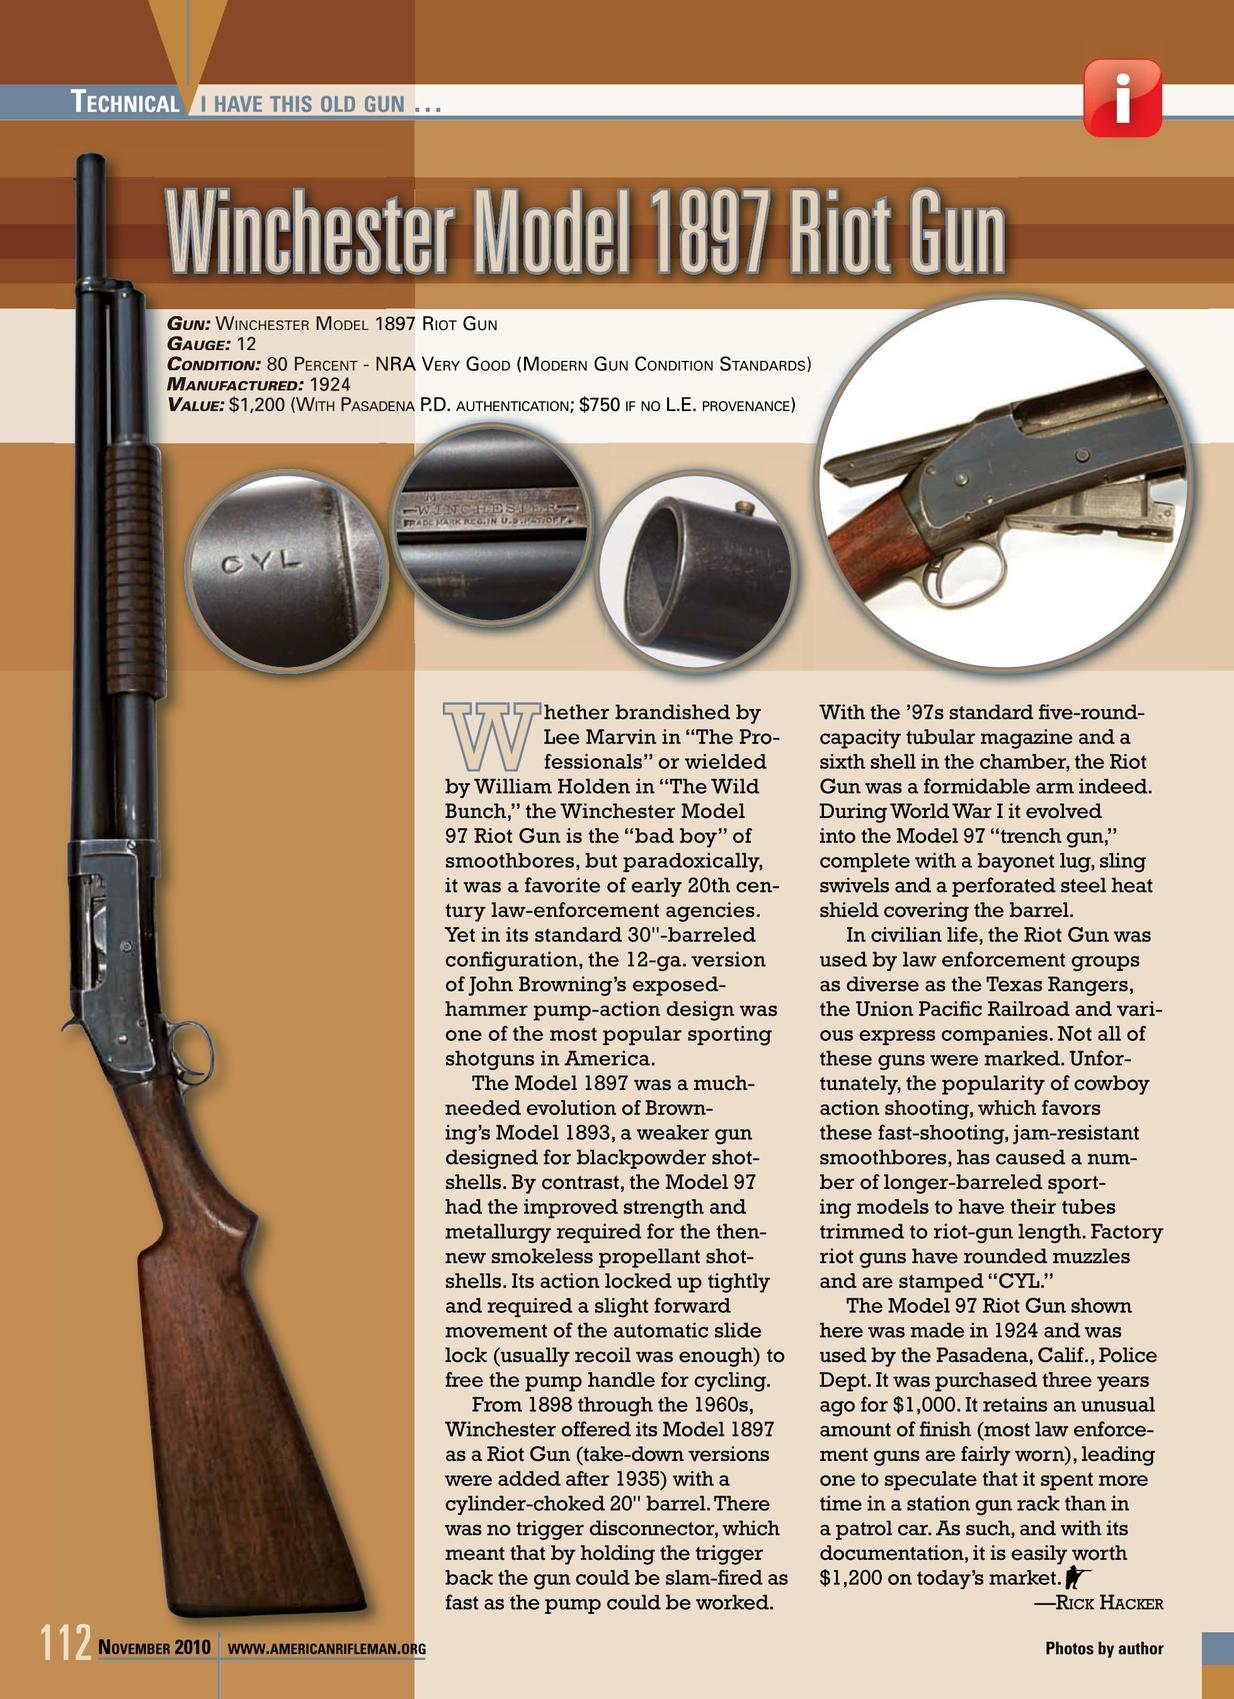 American Rifleman - November 2010